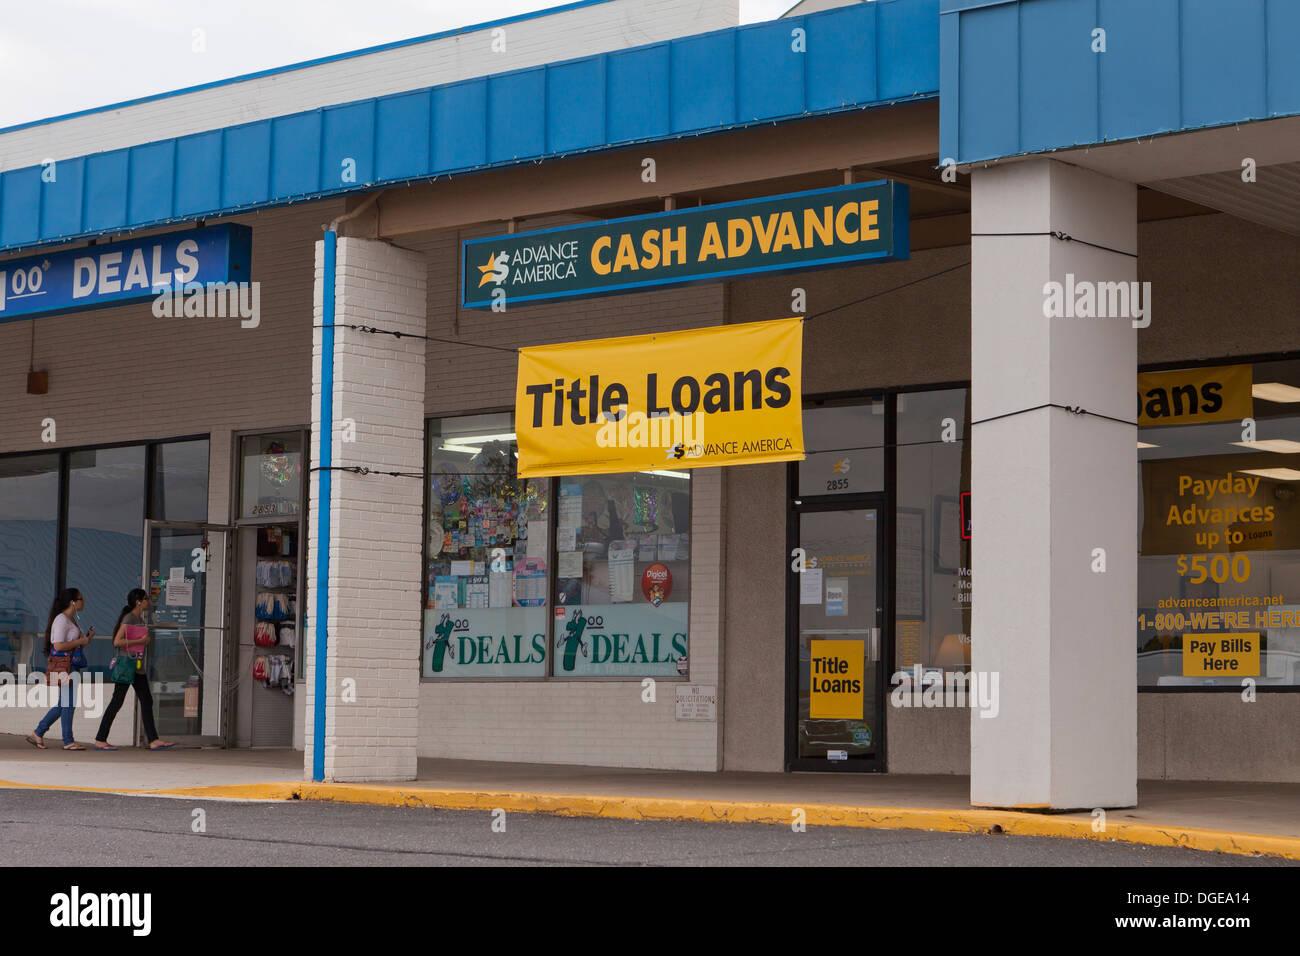 Advance America cash advance title loans storefront - Stock Image